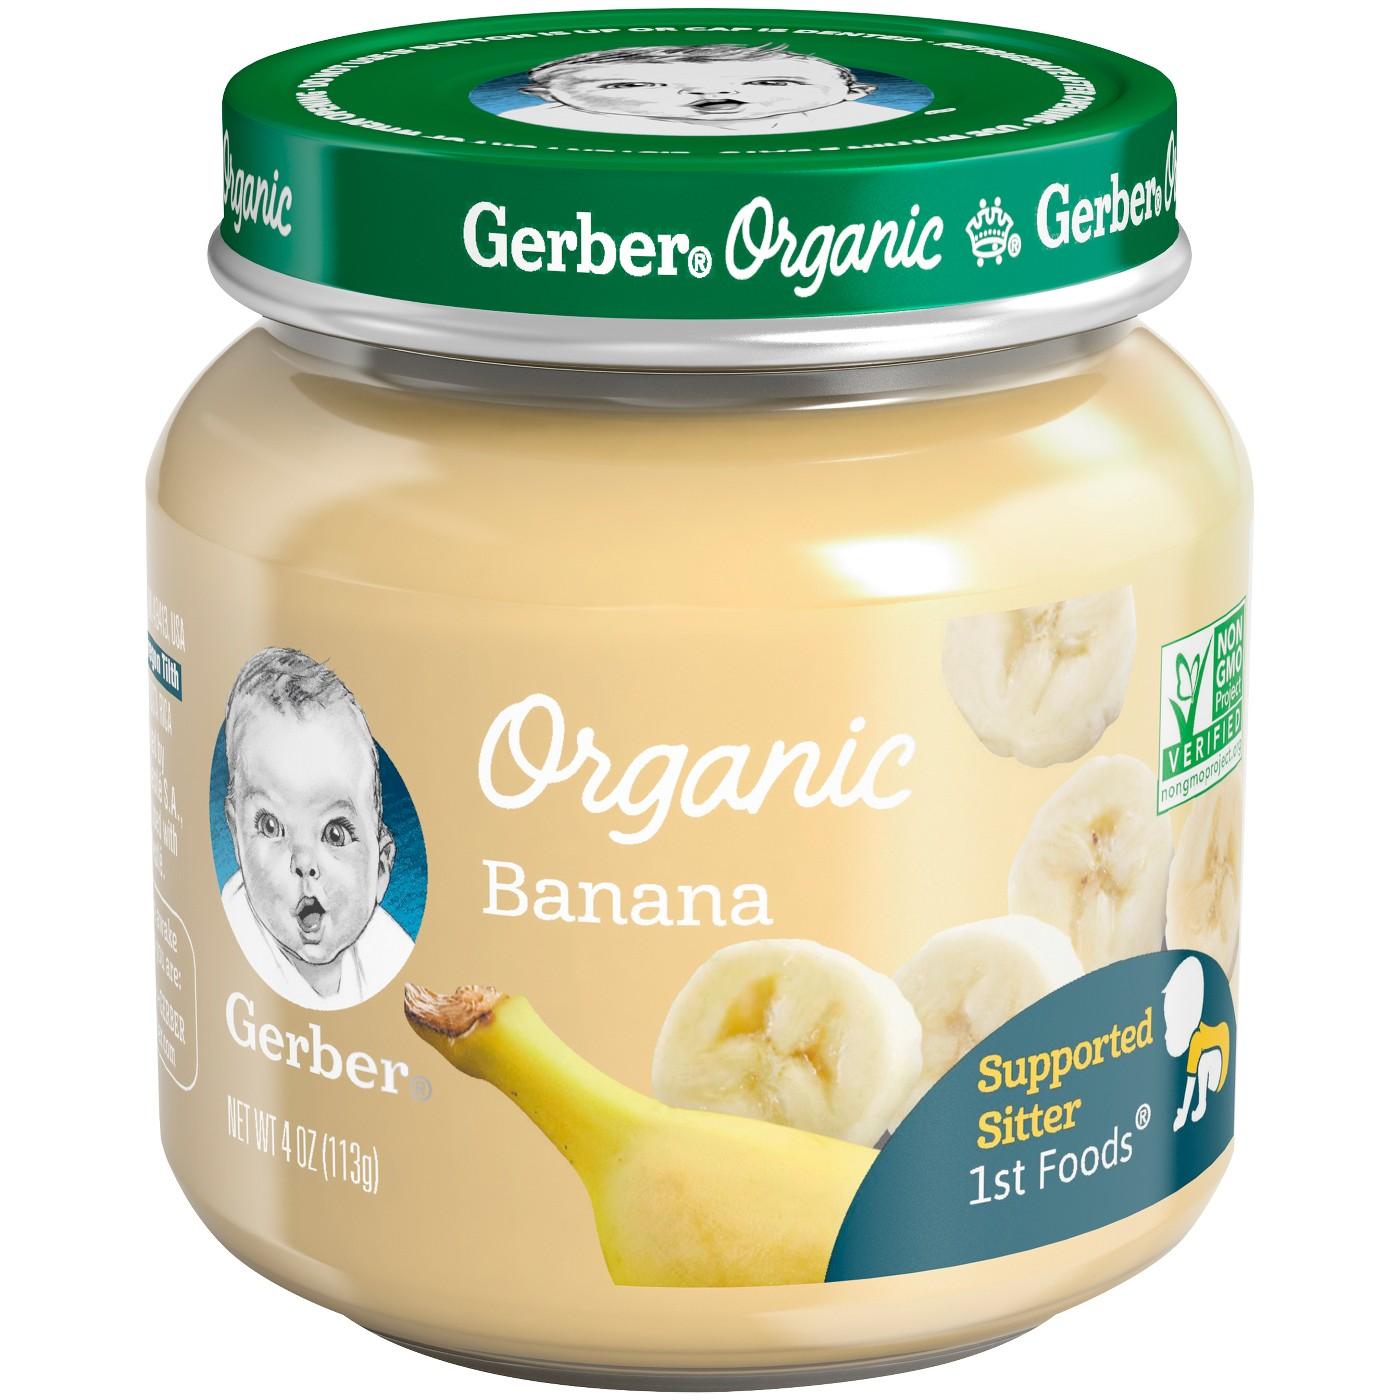 Gerber Baby Organic 1st Foods